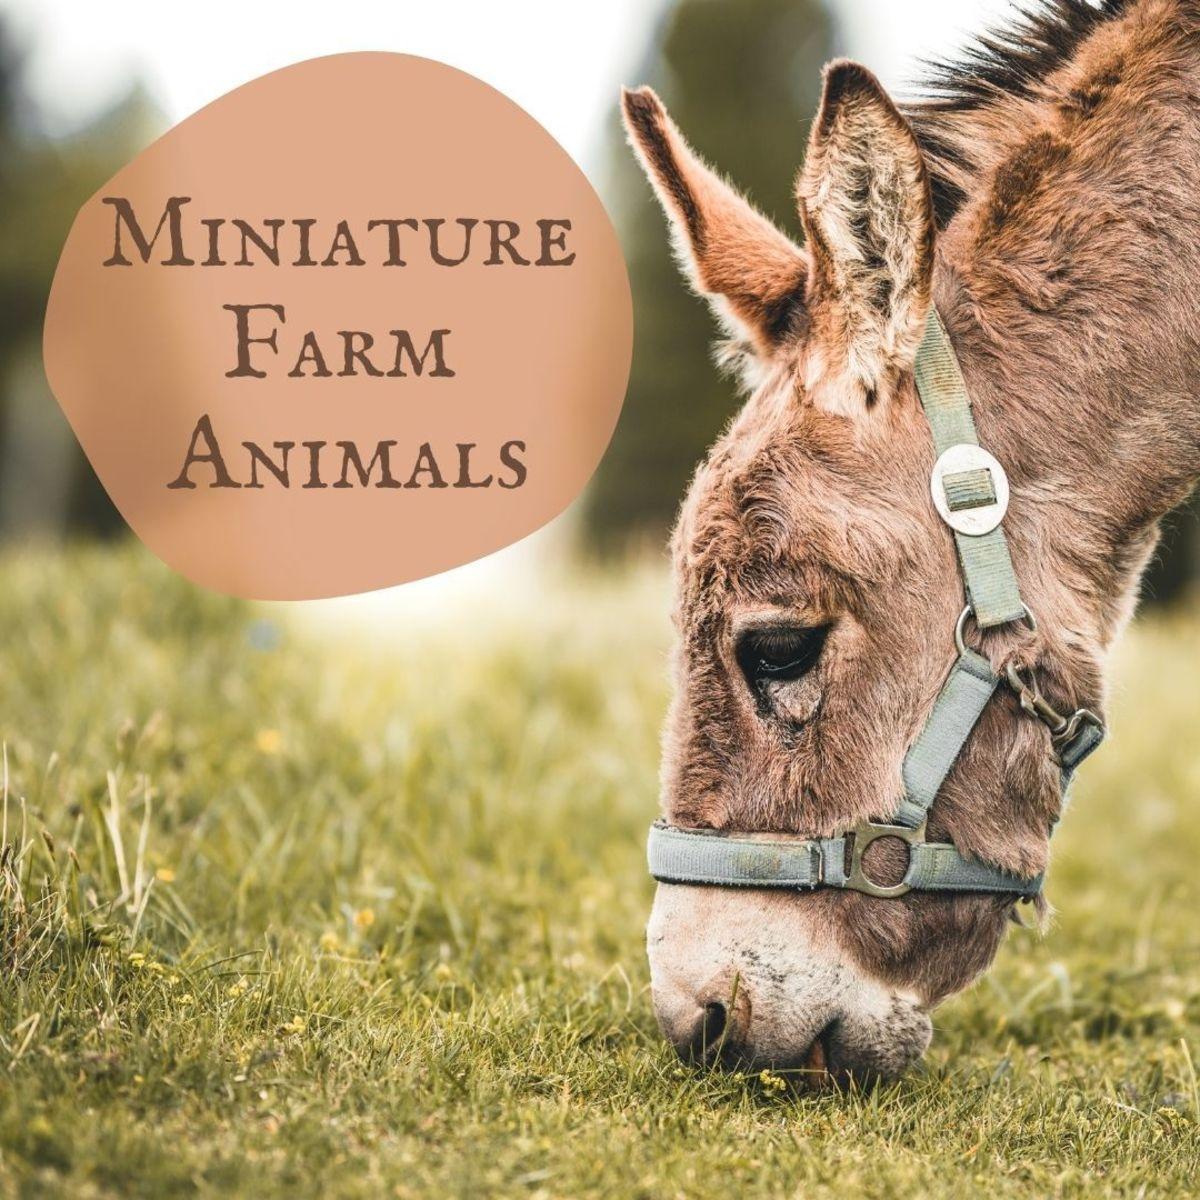 Miniature Farm Animals: A Guide to Miniature or Small Livestock